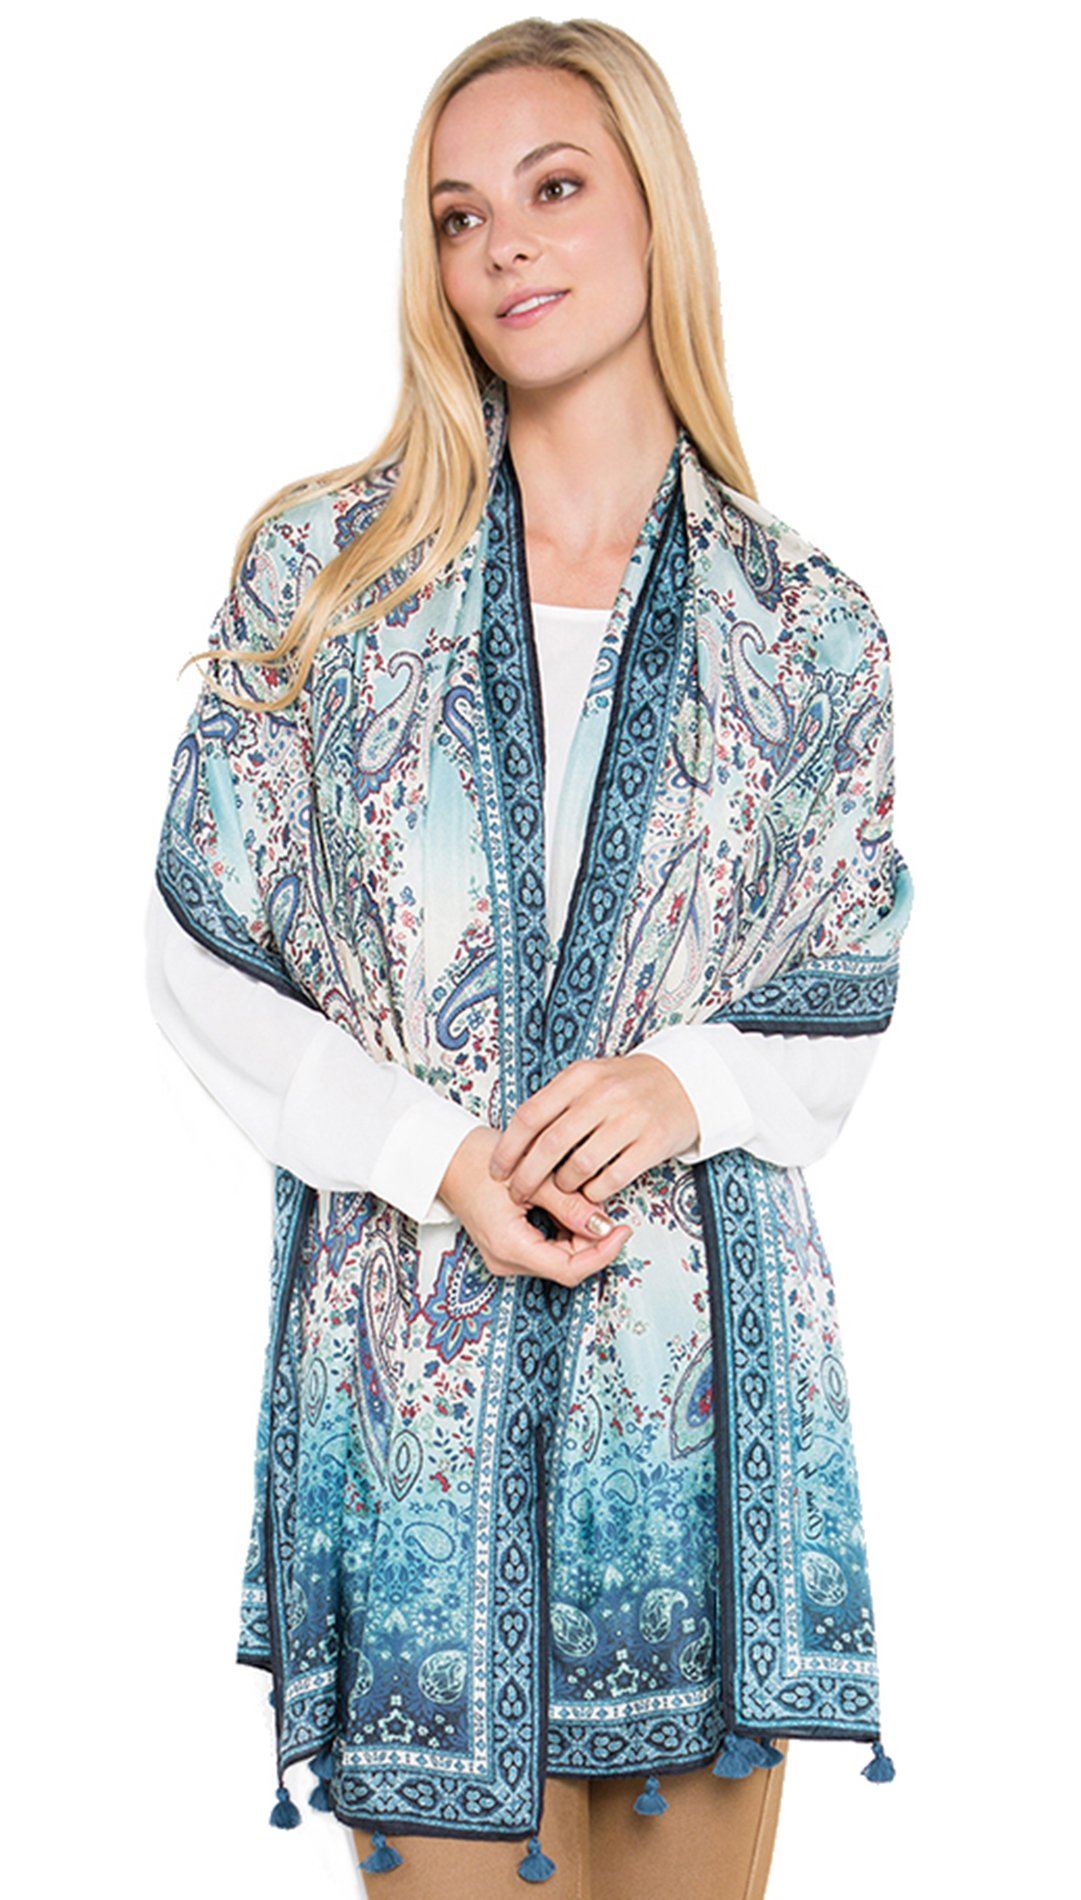 Fine Silk Scarf for Women-Luxury Fashion Print Extra Long Lightweight Wrap Shawl Headscarf by d'IRIS (Image #2)